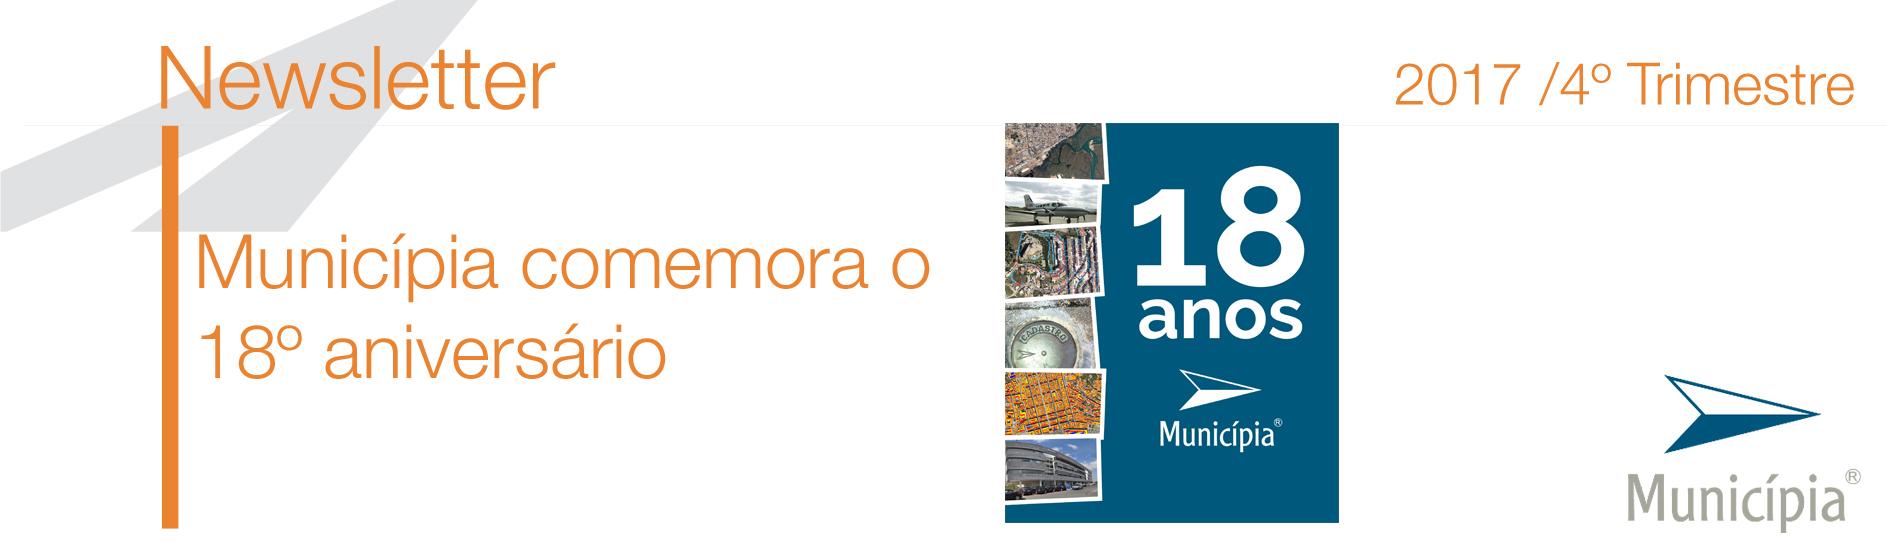 Newsletter Municípia